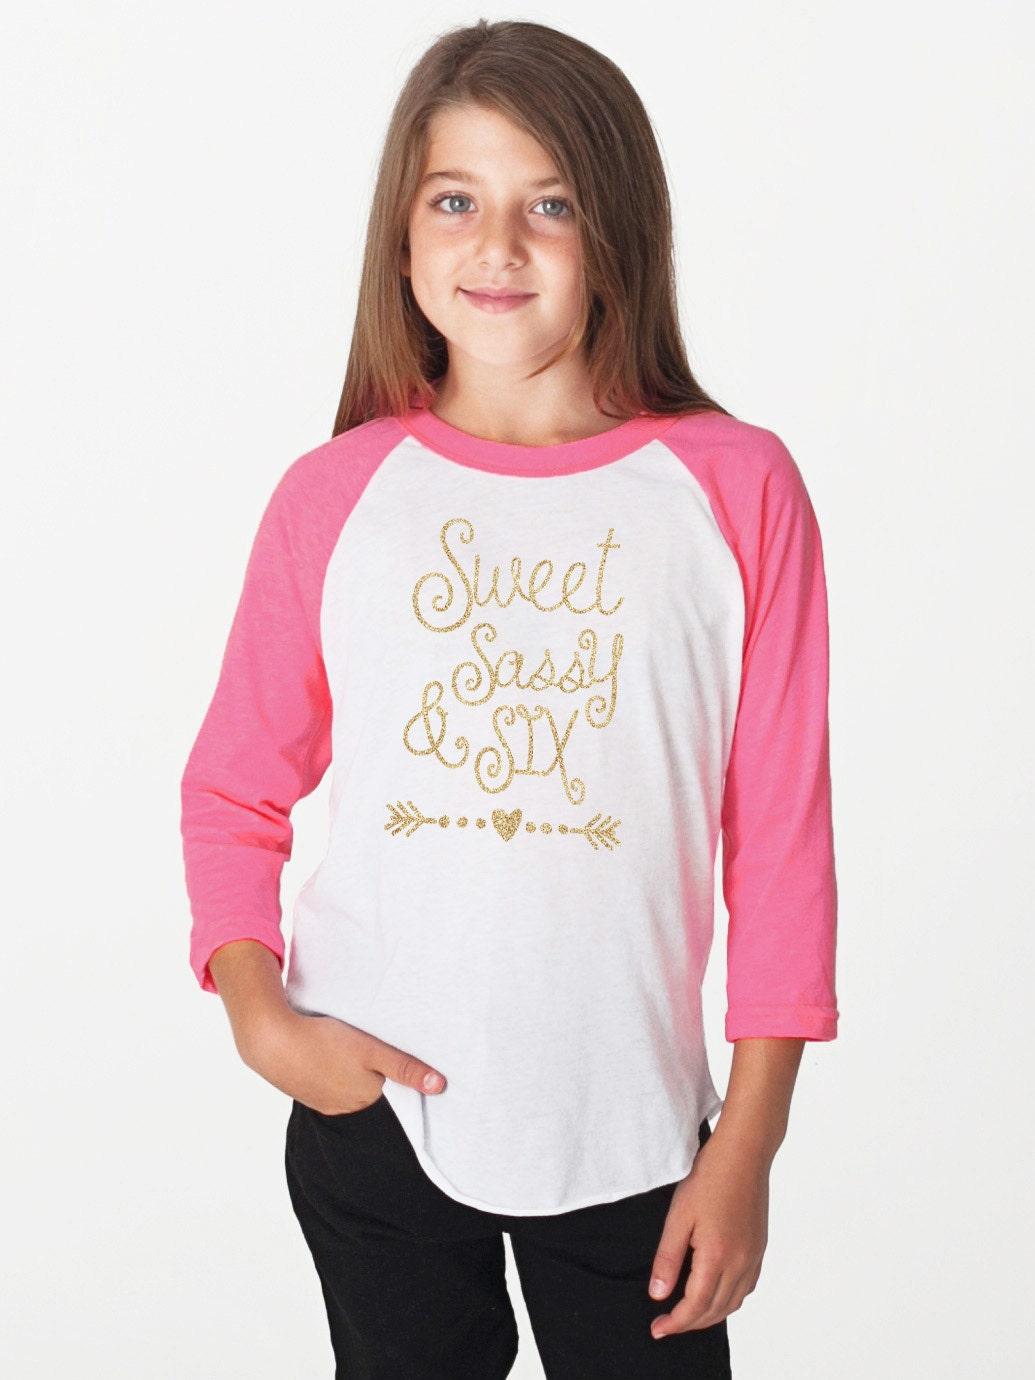 Two Sassy Birthday Girl Shirt / Baby Girl Clothes 2 Year Old |Sassy Birthday Shirts